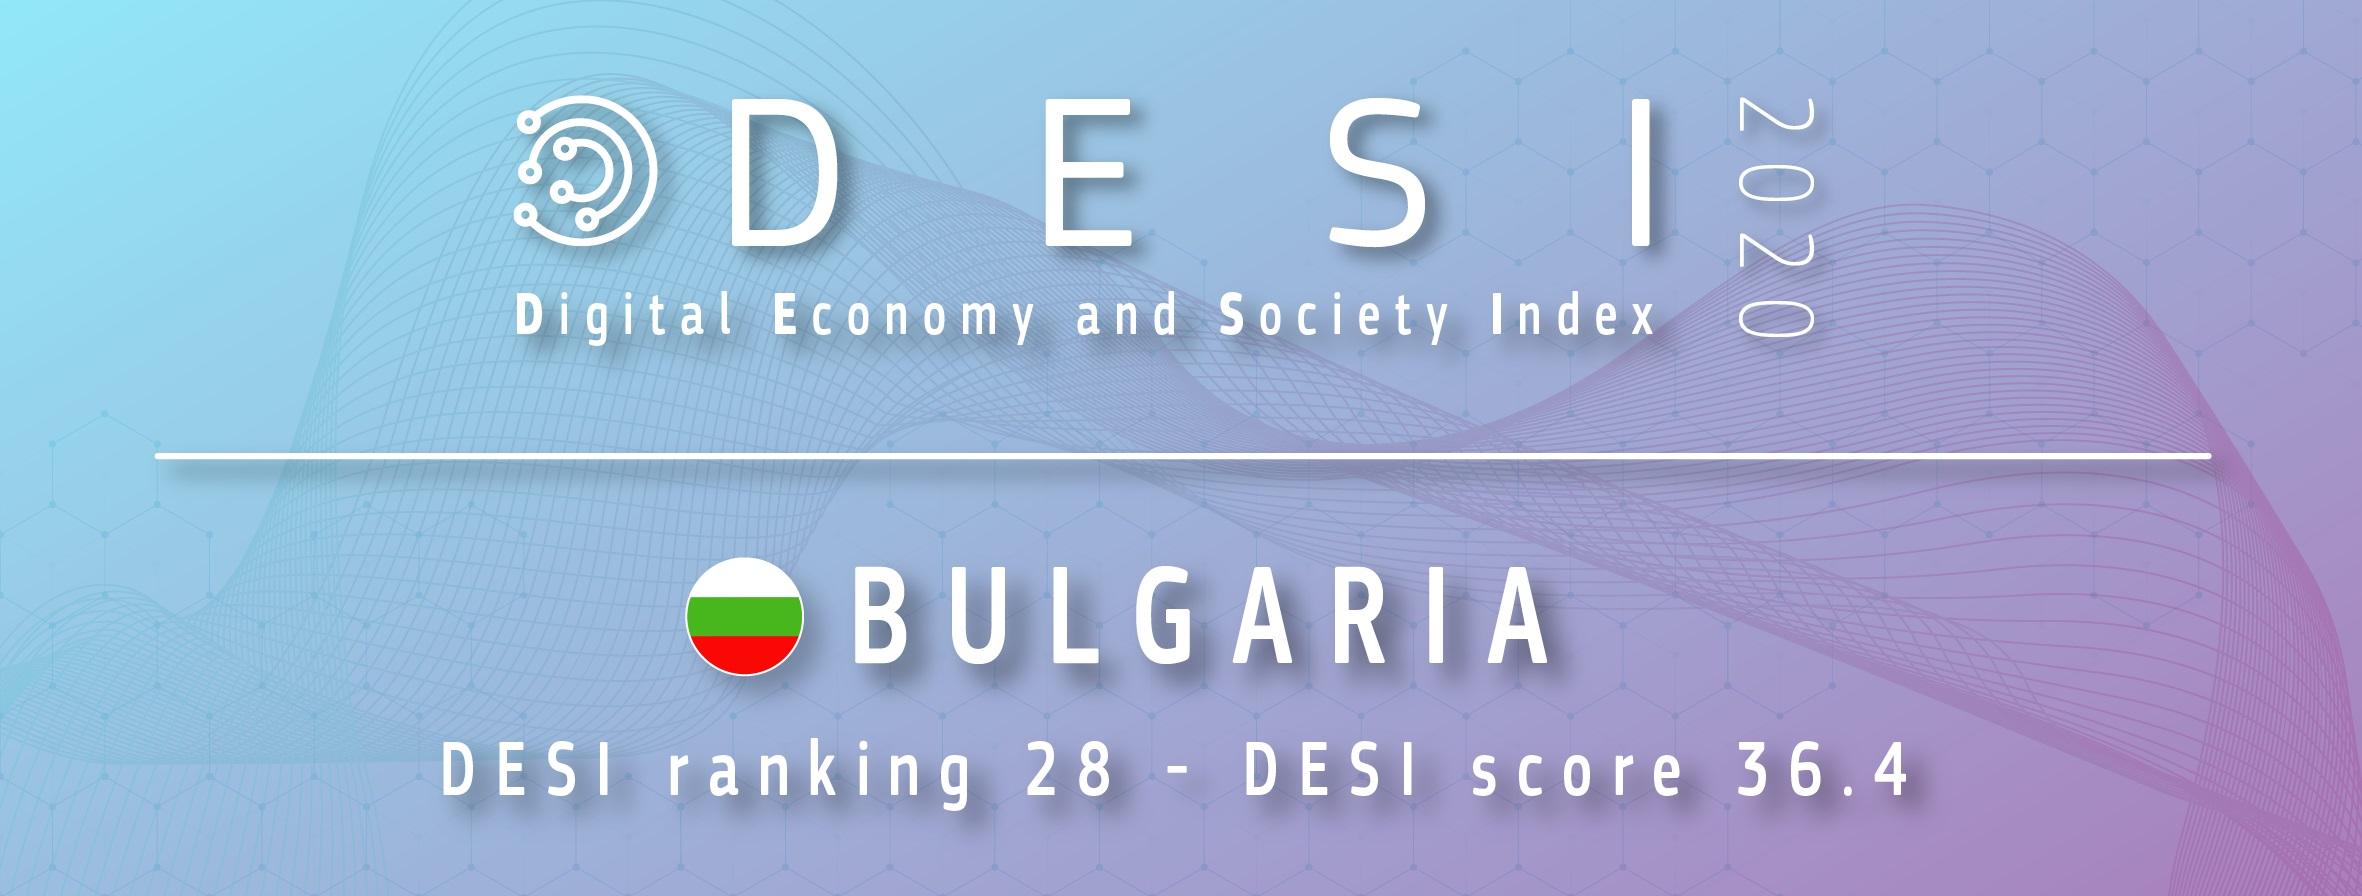 desi_2020_Bulgaria